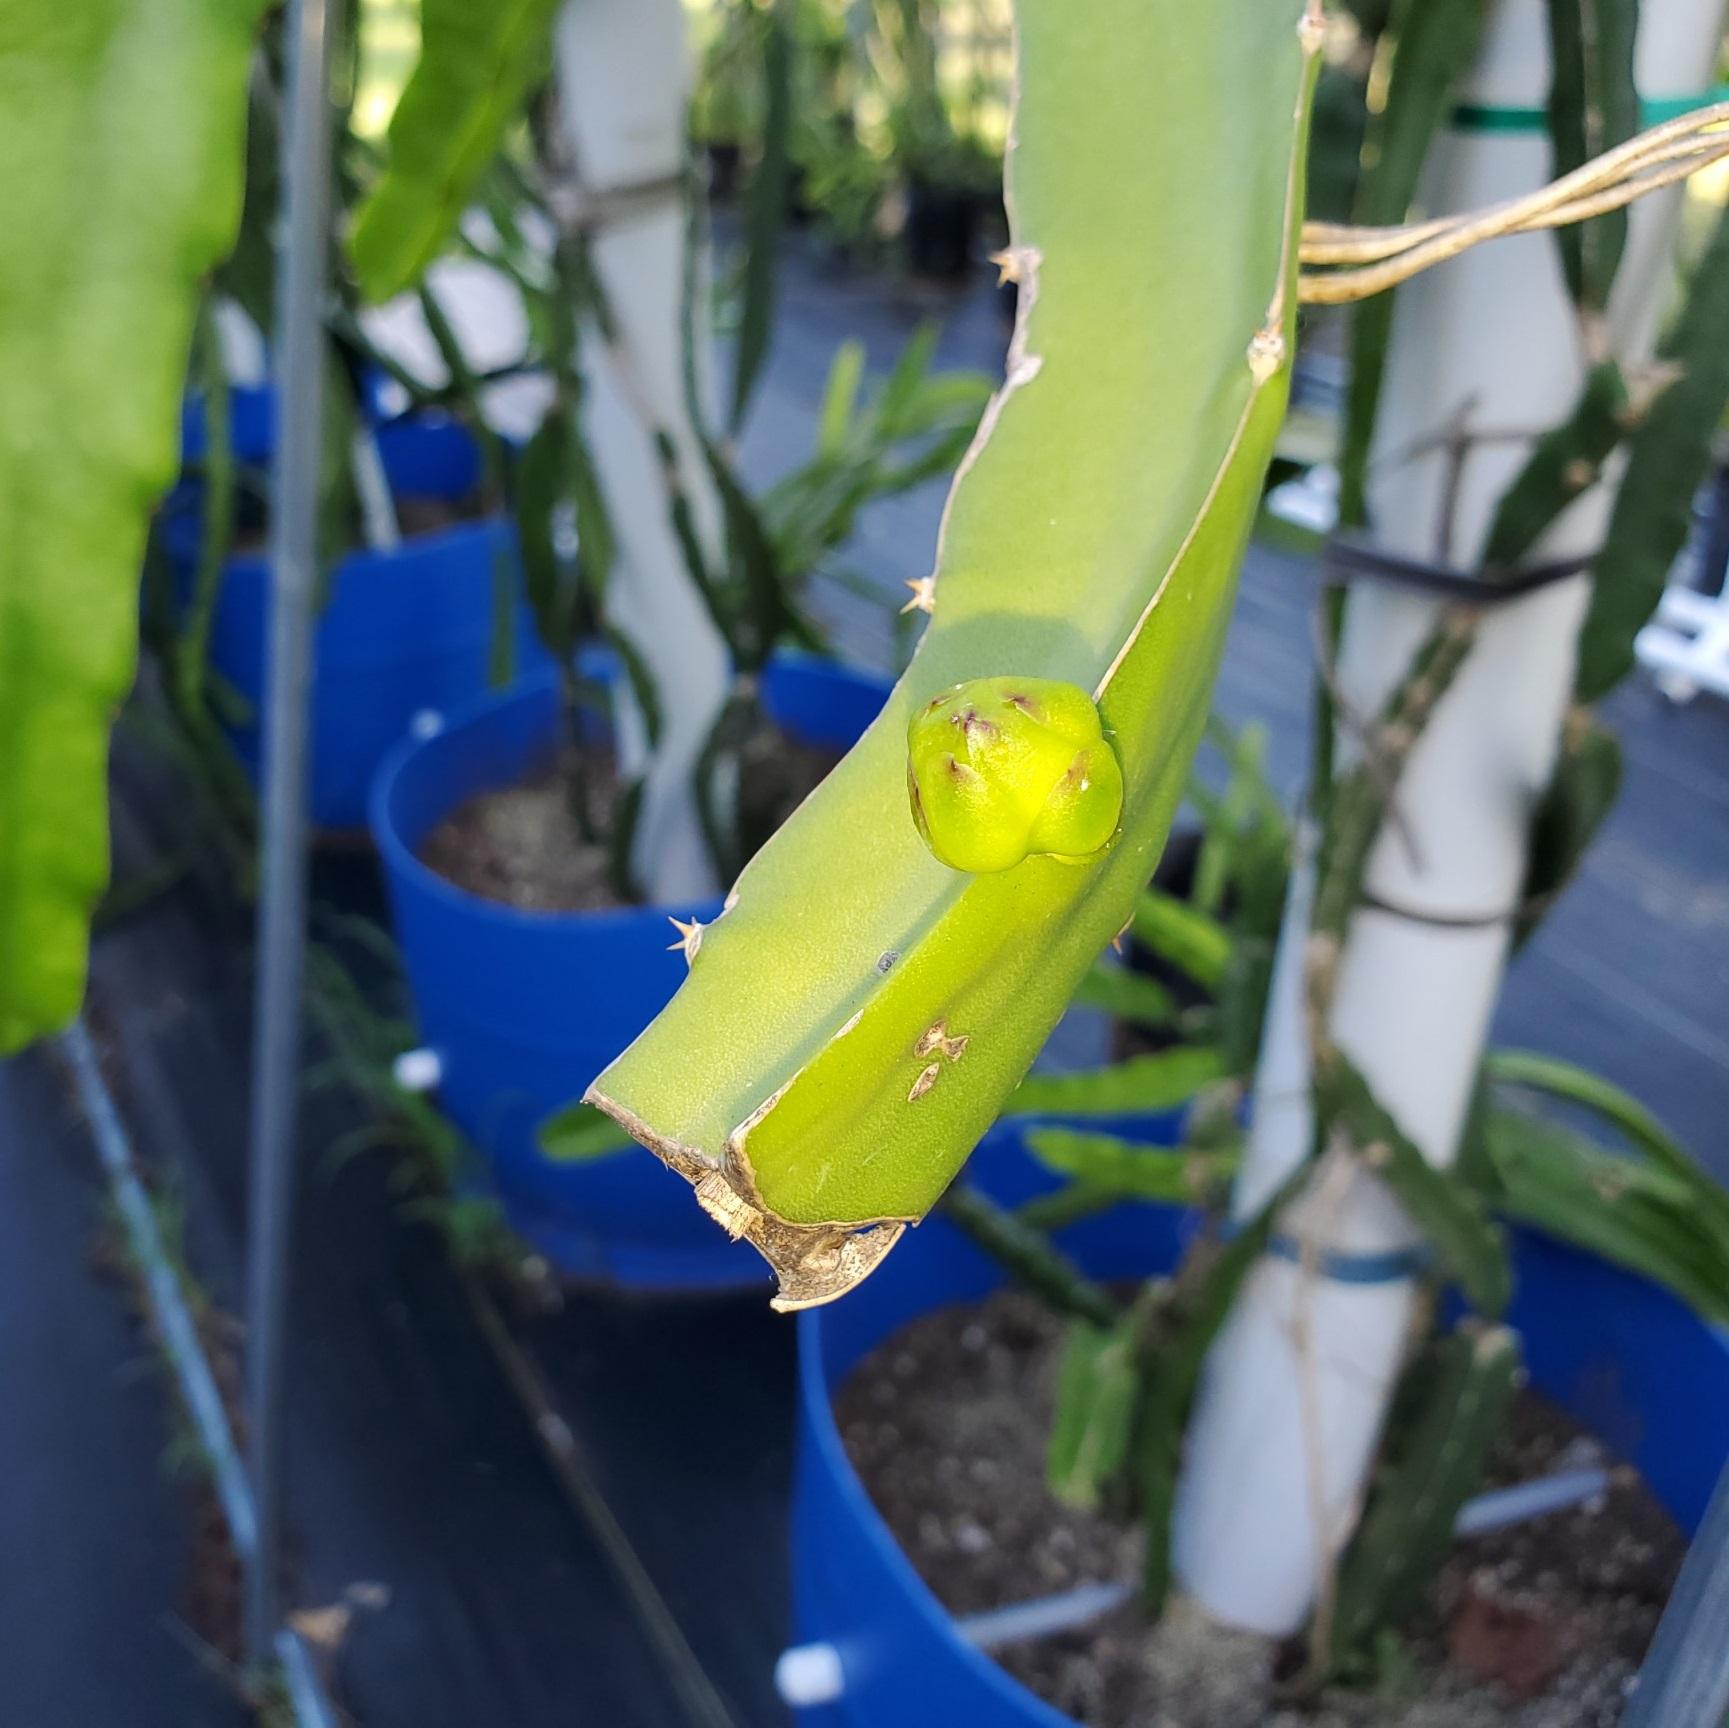 Israel Yellow Dragon Fruit Flower Bud